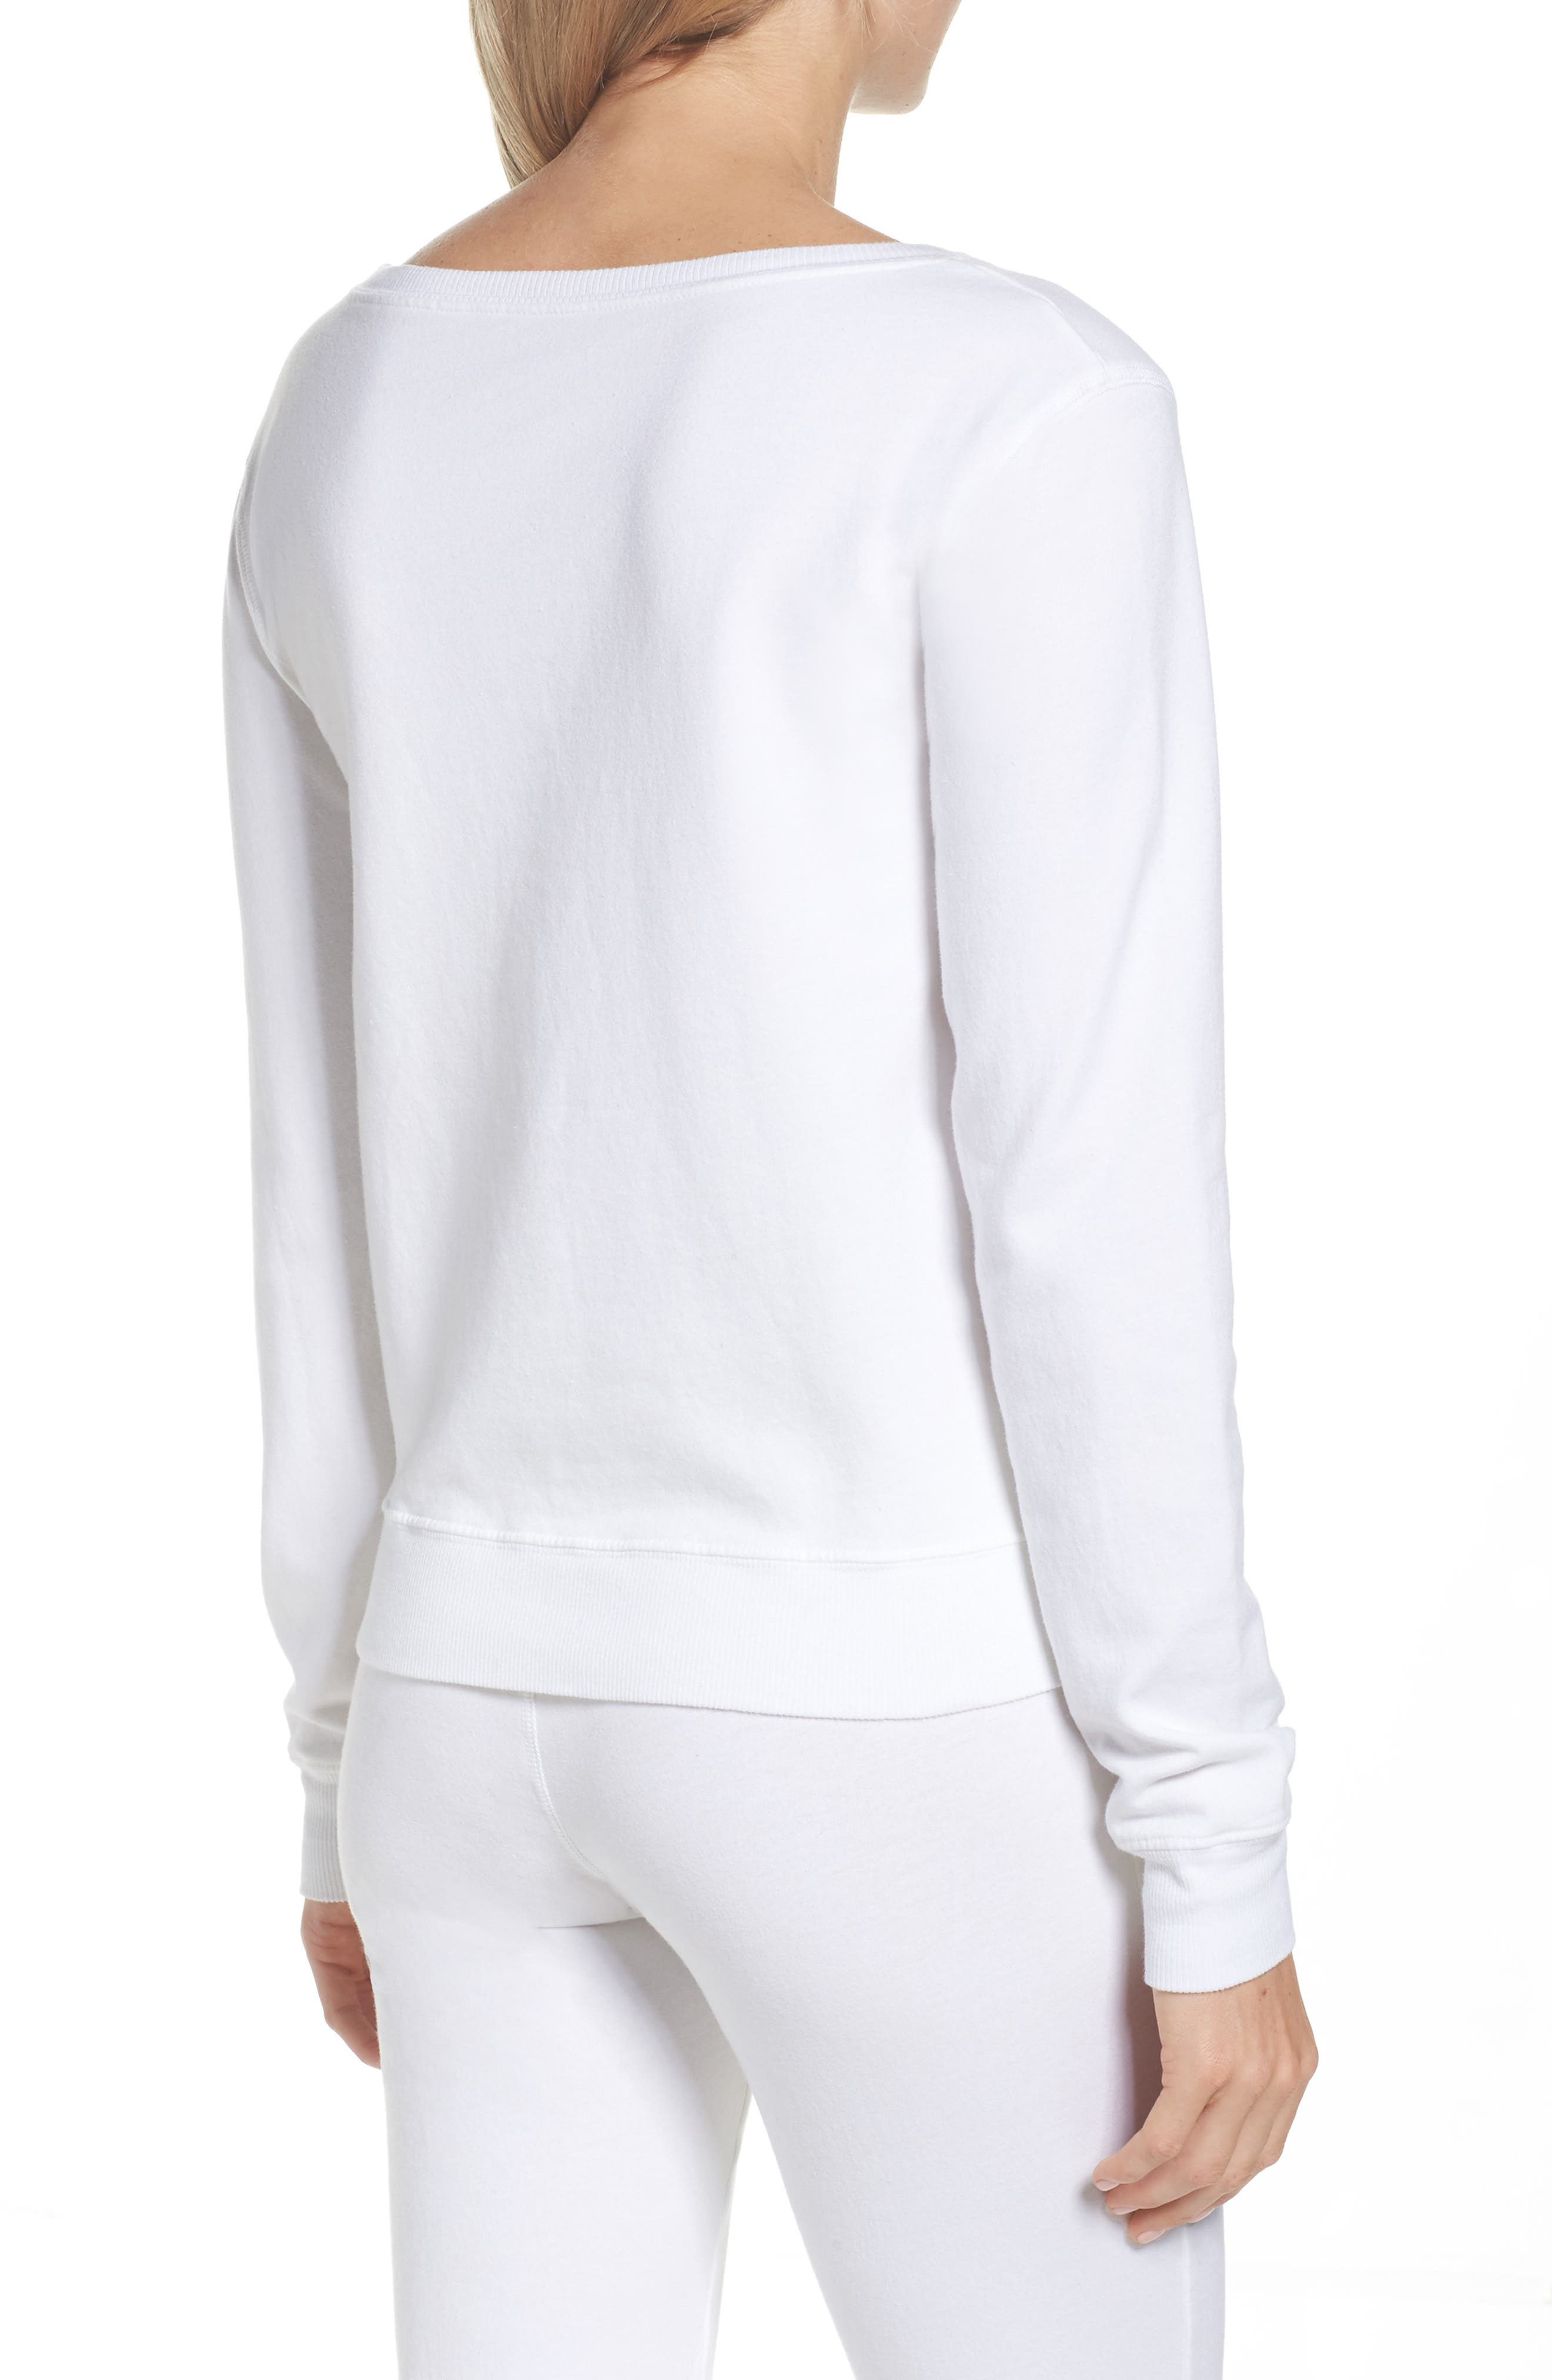 Lordes Fuzzy Fleece Sweatshirt,                             Alternate thumbnail 2, color,                             100